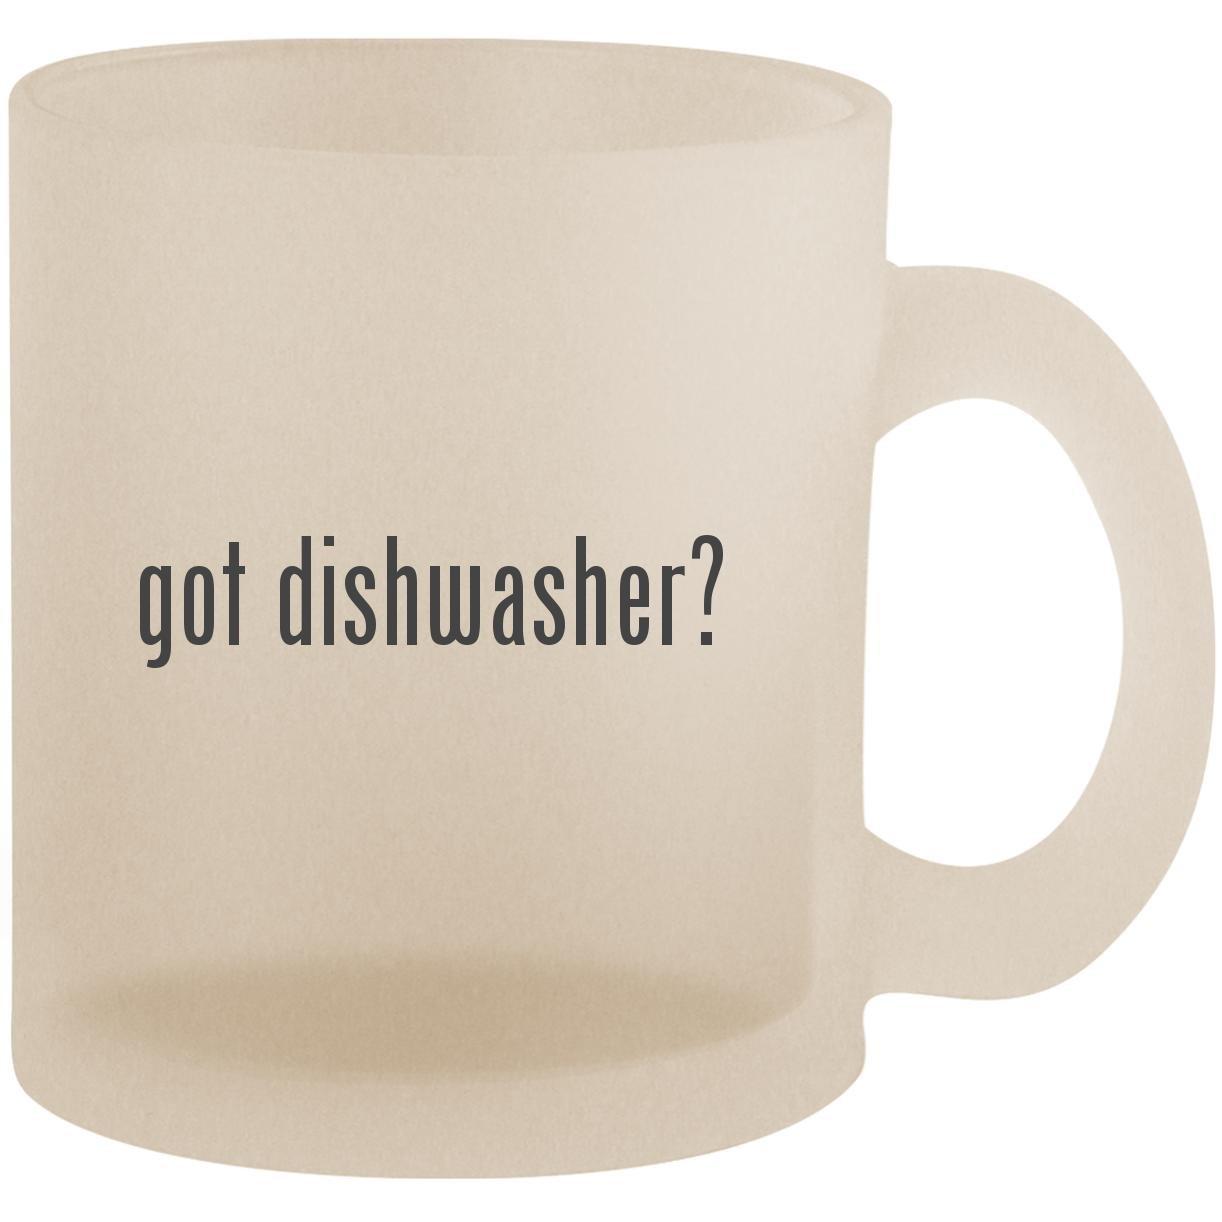 got dishwasher? - Frosted 10oz Glass Coffee Cup Mug